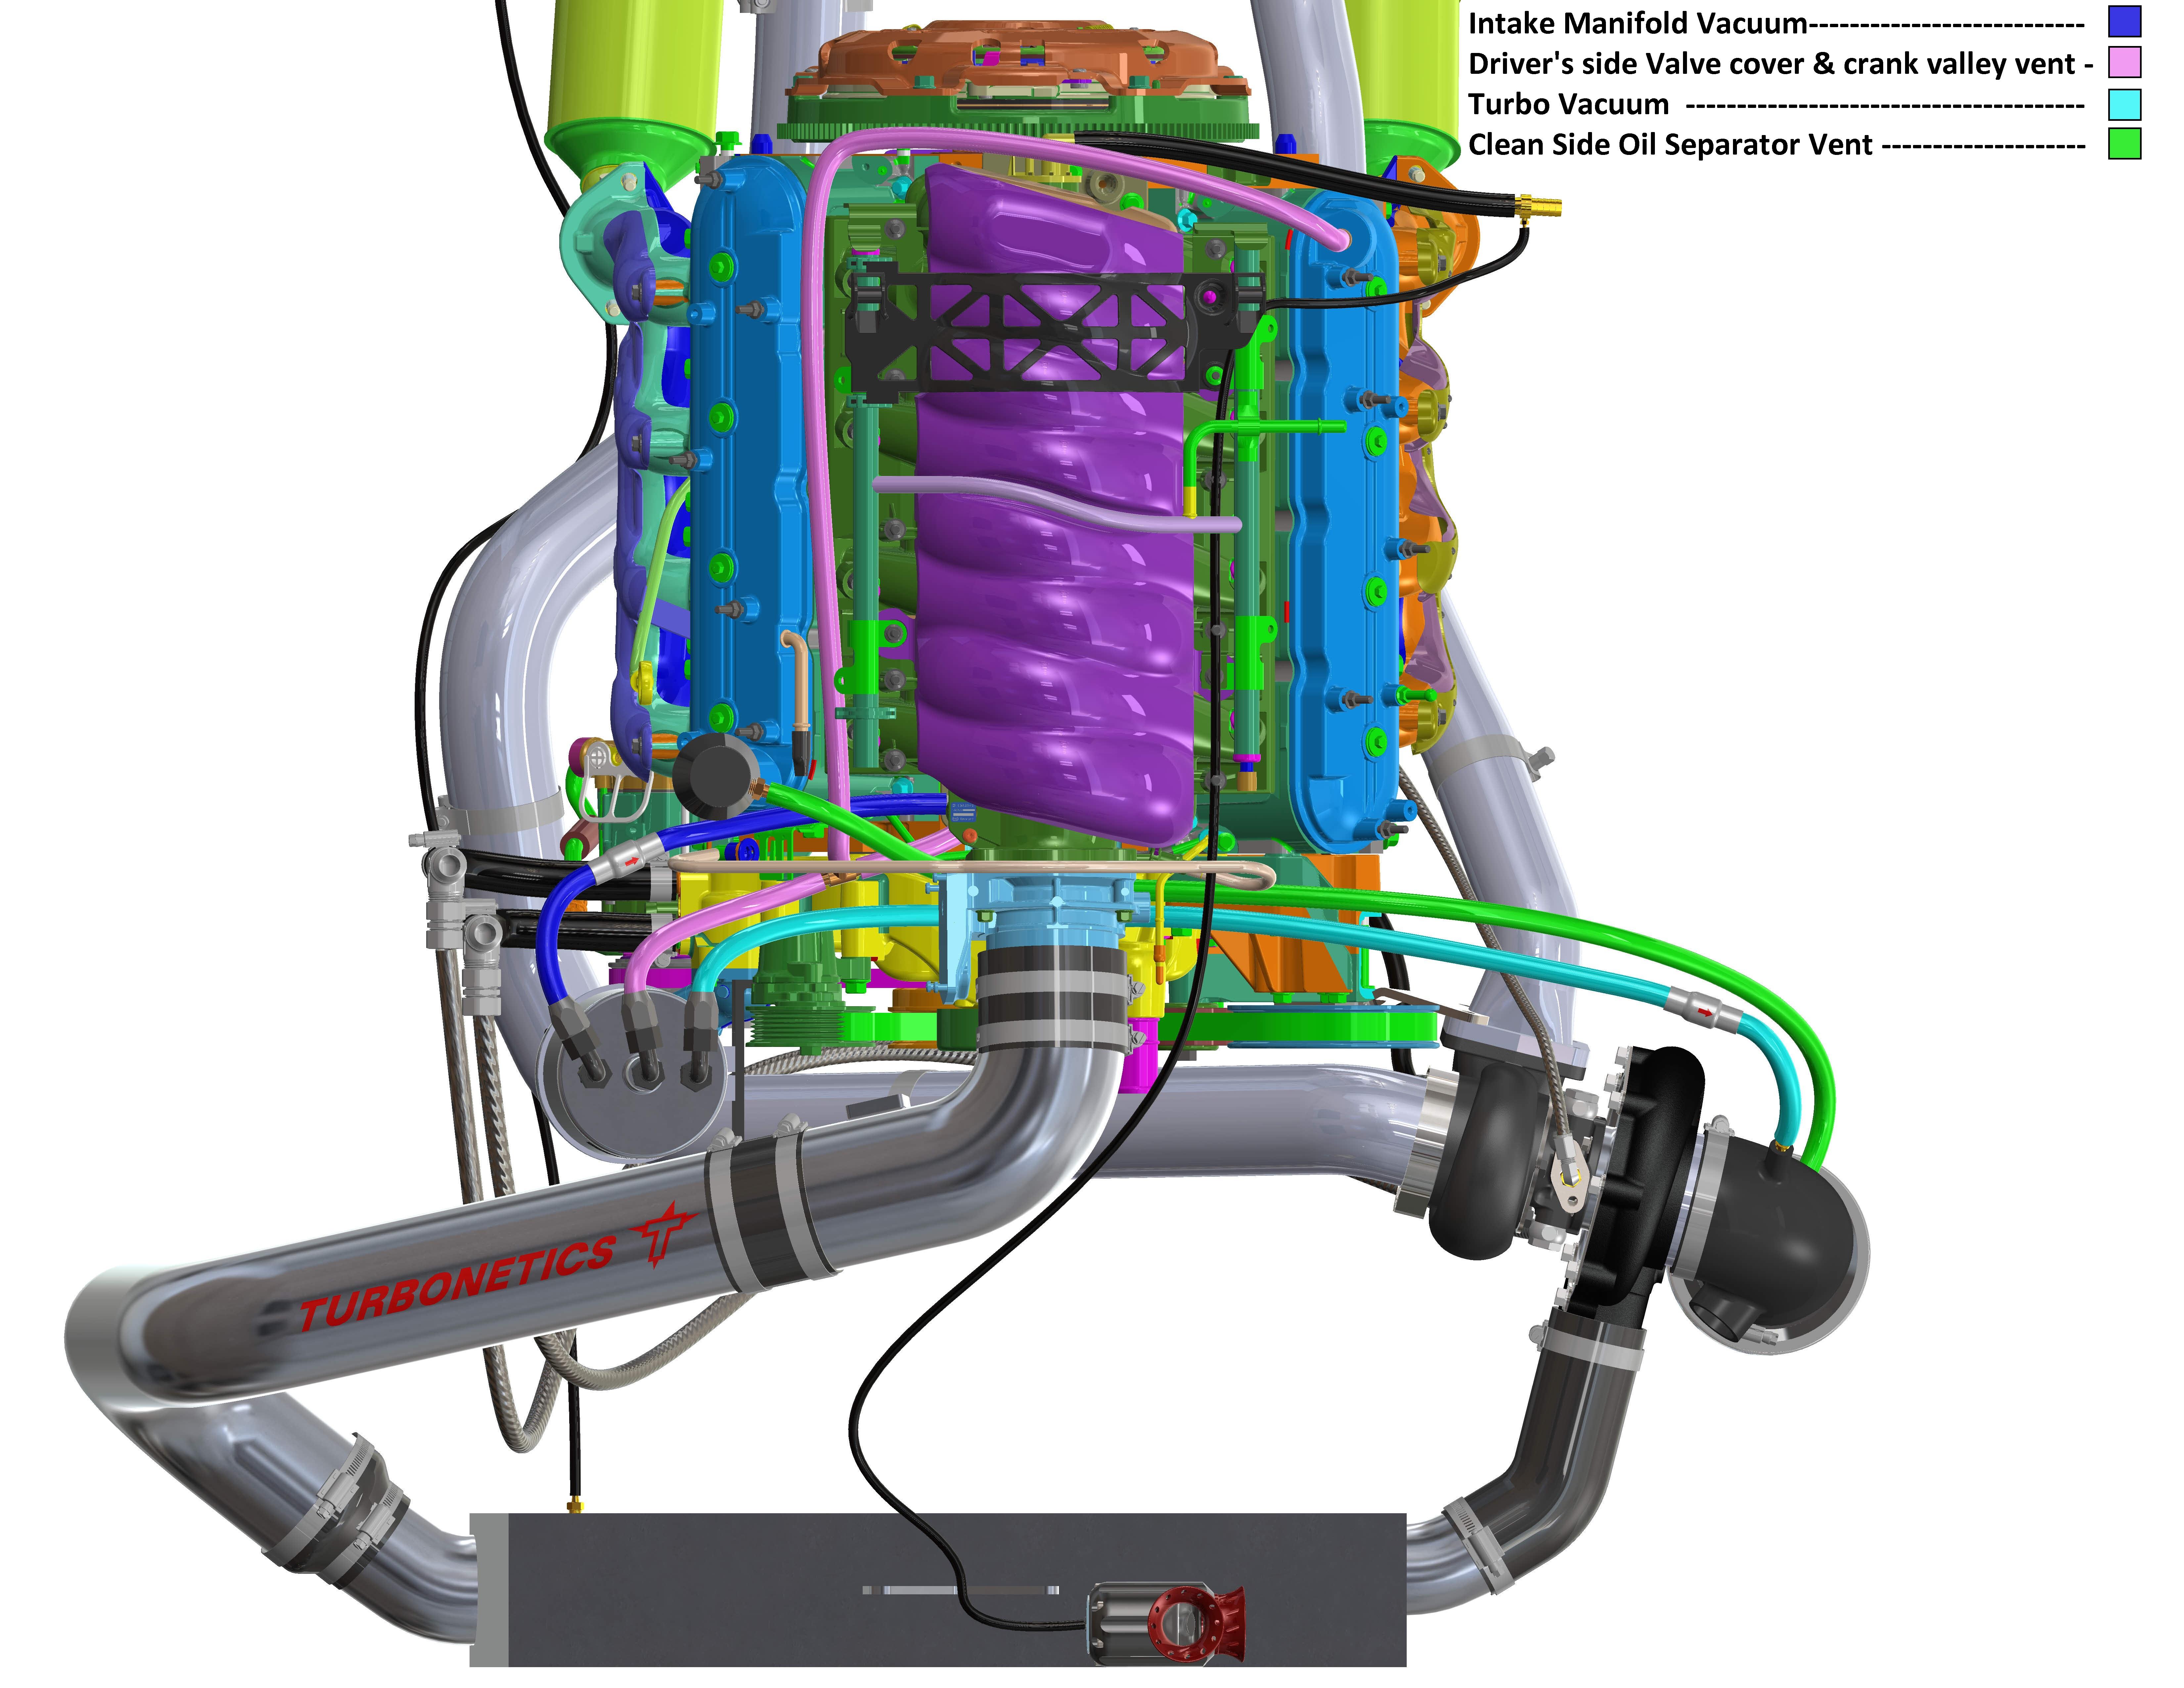 camaro-turbo-catch-can-install-diagram-1-1-copy.jpg